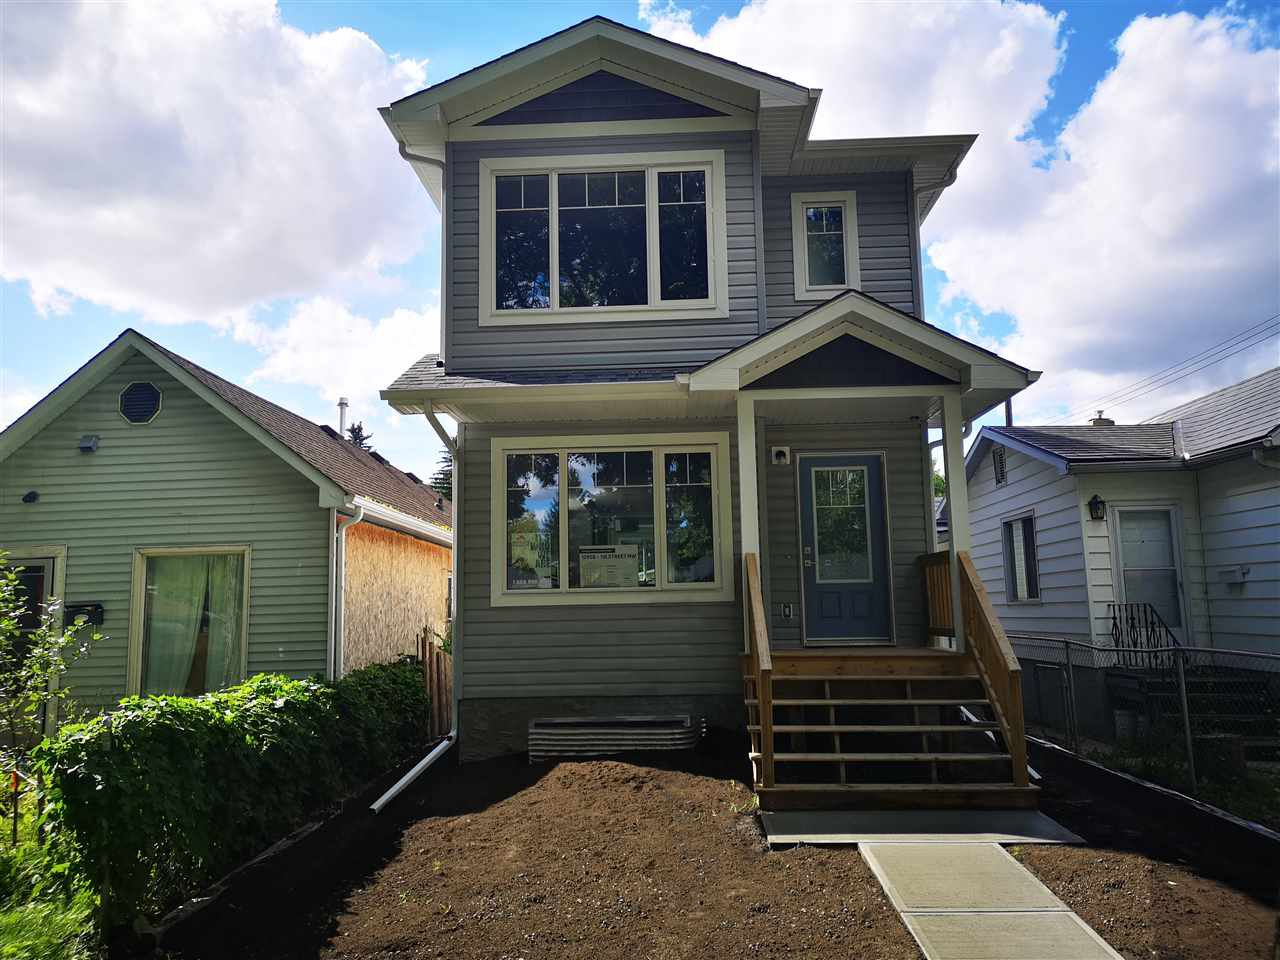 Main Photo: 12958 116 Street in Edmonton: Zone 01 House for sale : MLS®# E4184143